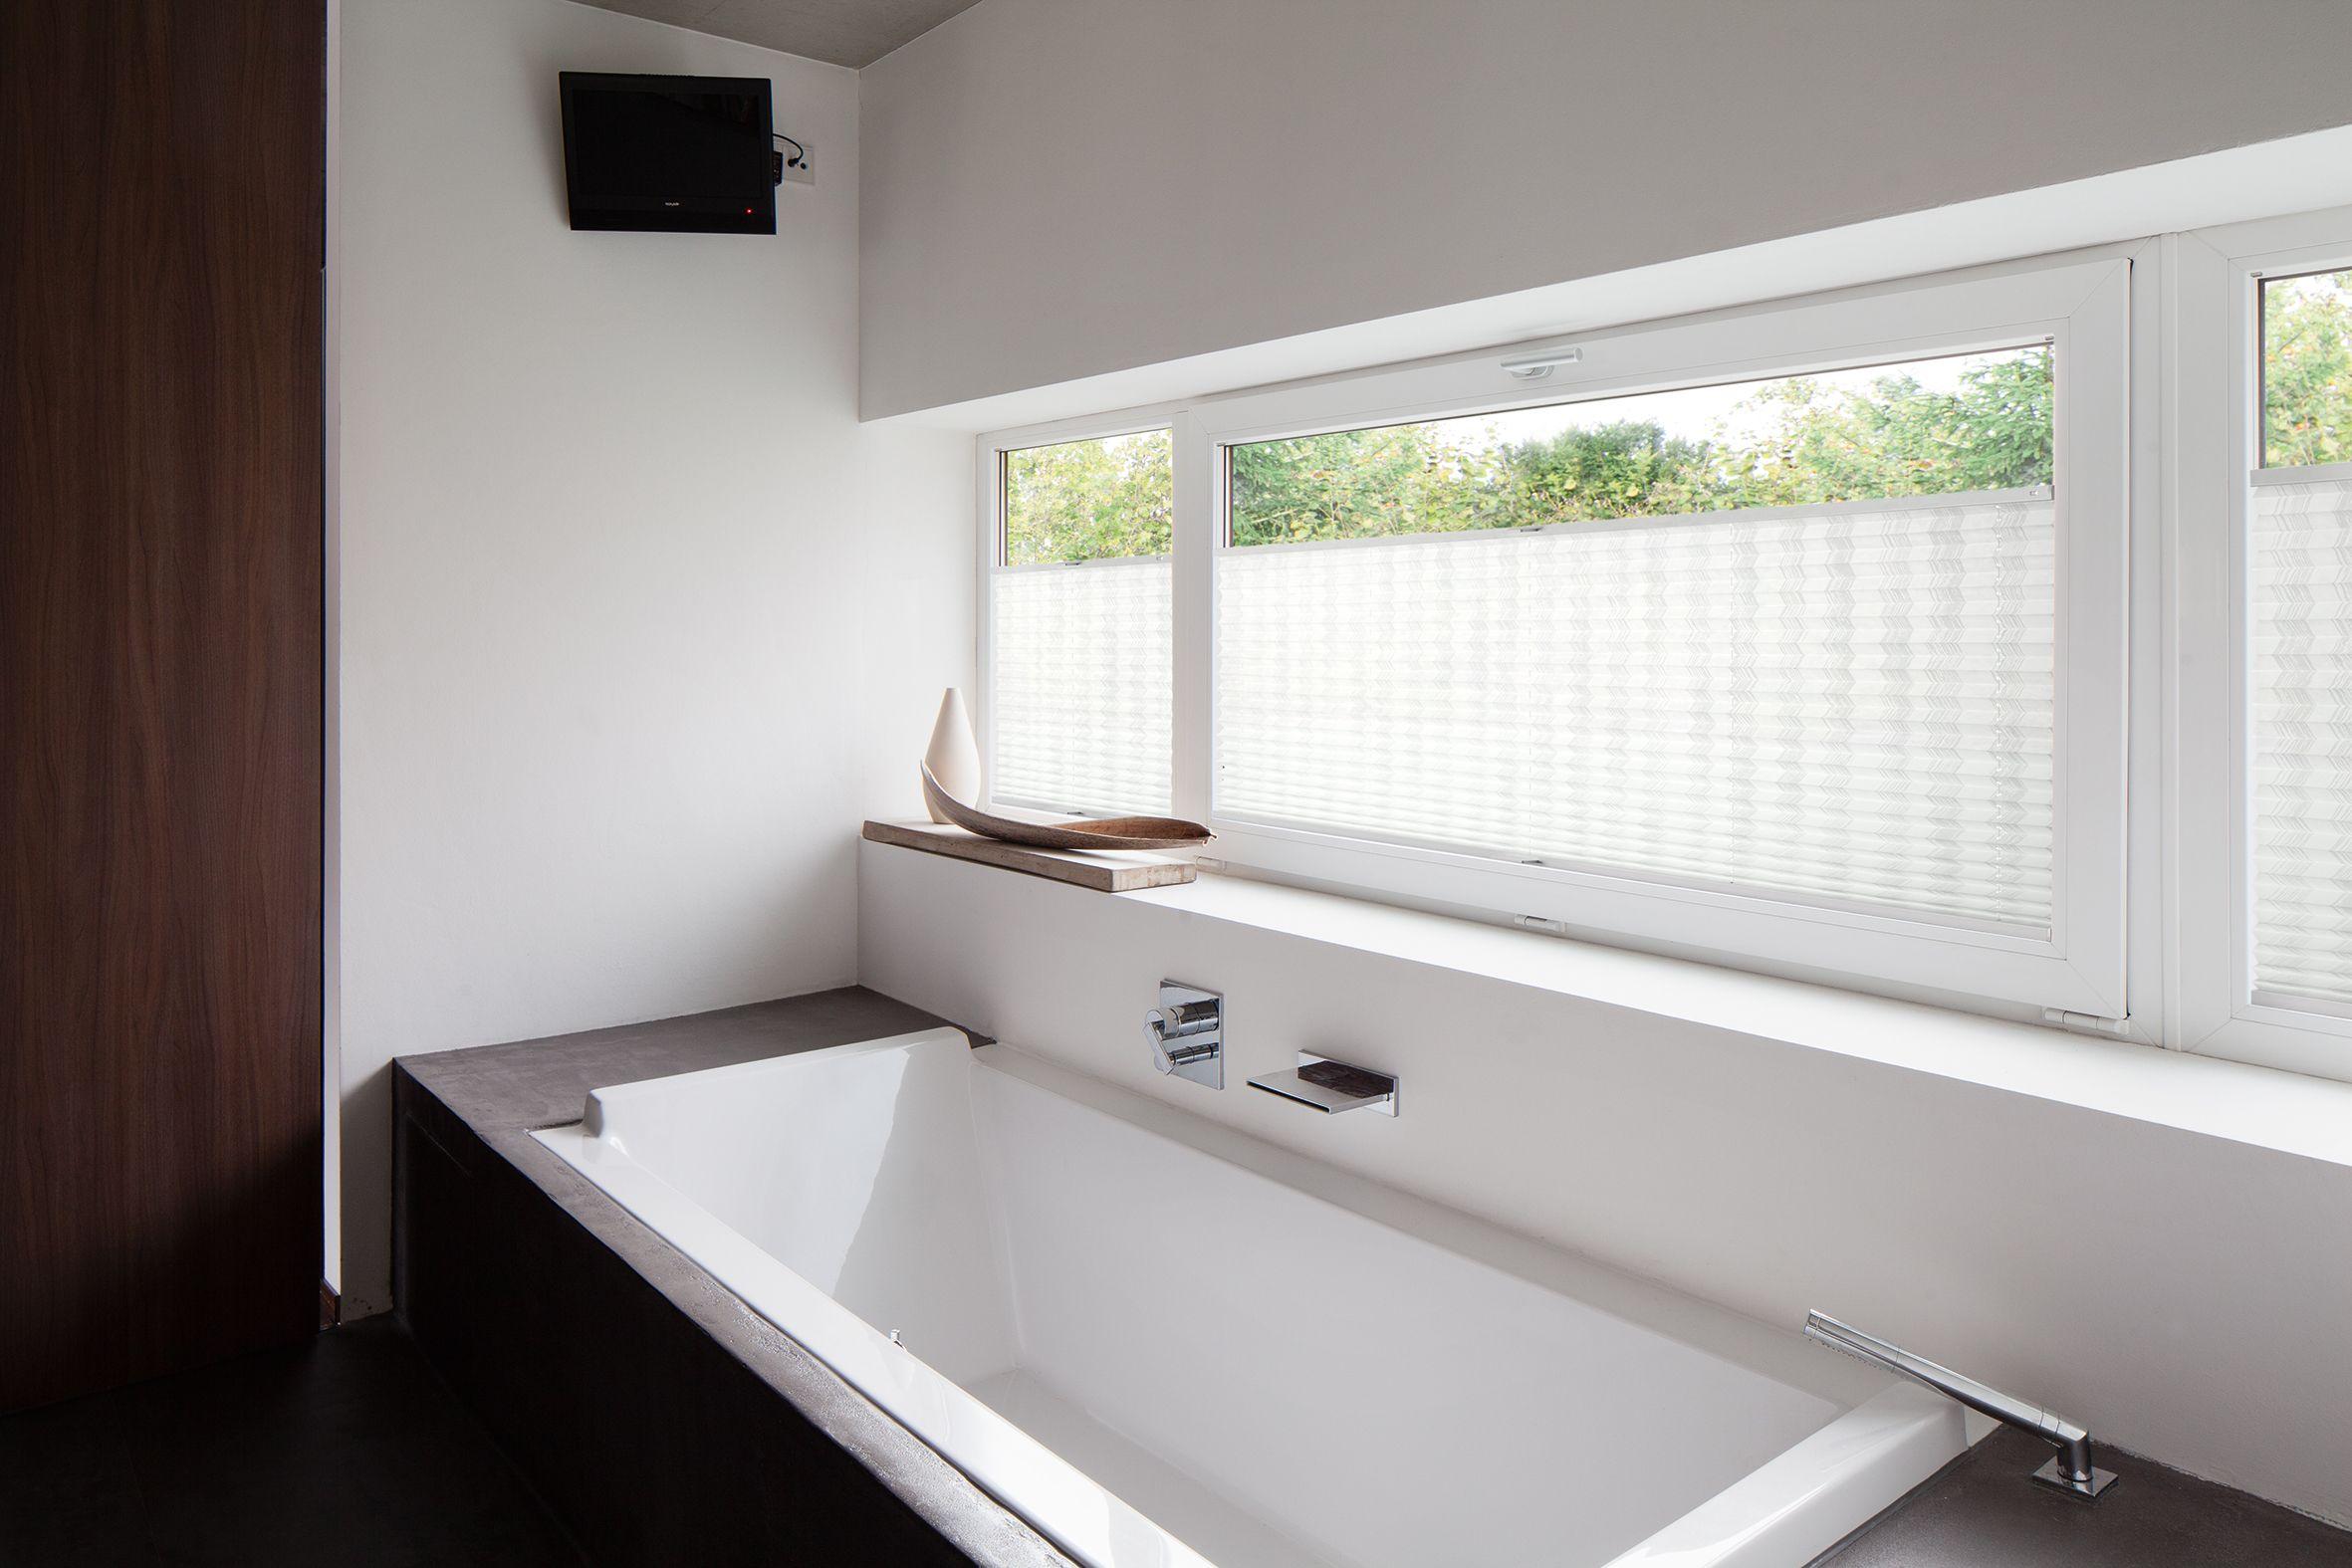 Mhz Plissee Plissee Vorhange Badezimmer Plissee